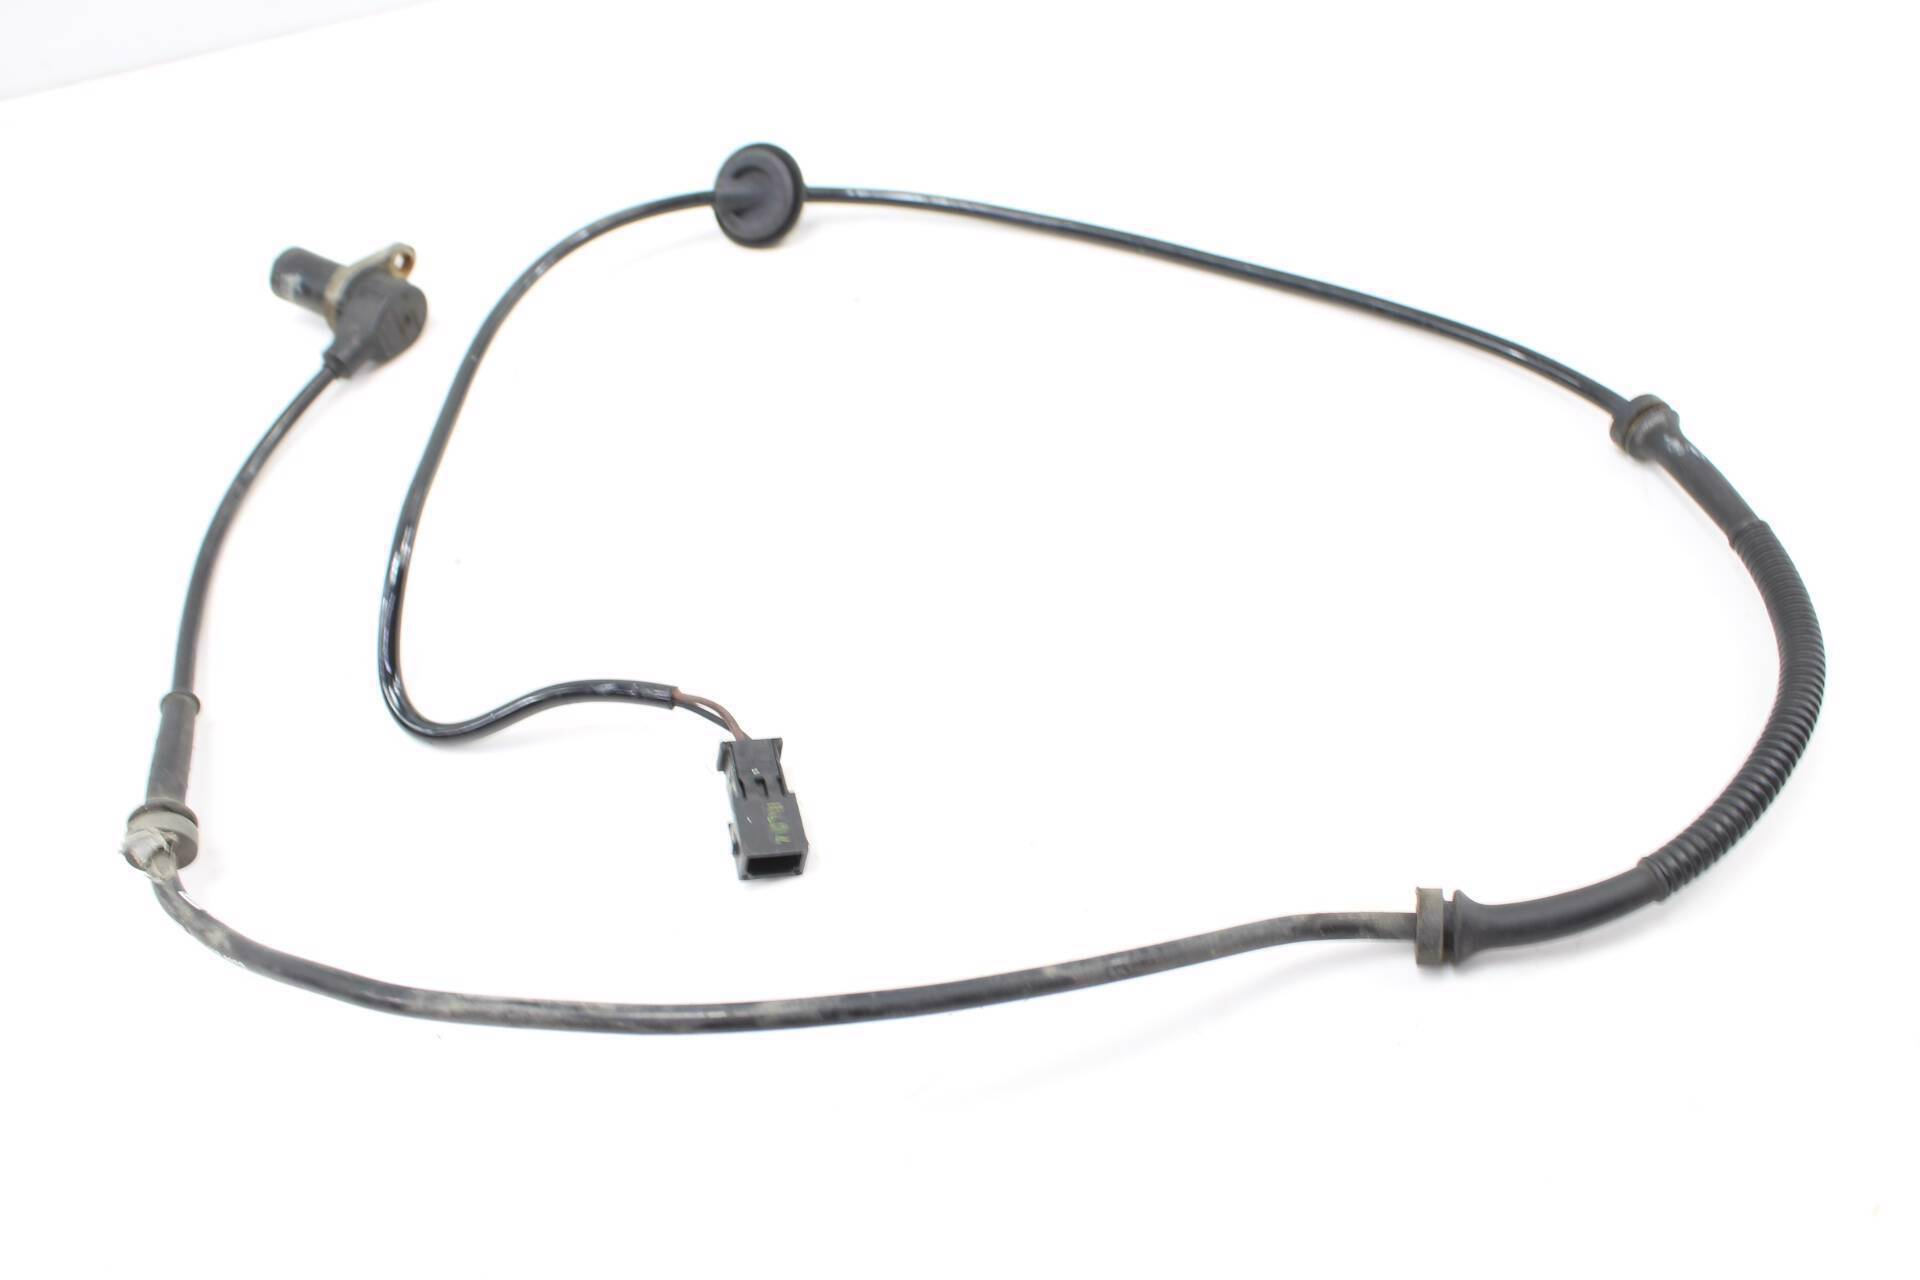 New Rear Right ABS Wheel Speed Sensor for Audi A4 Quattro S4 8E0927807B